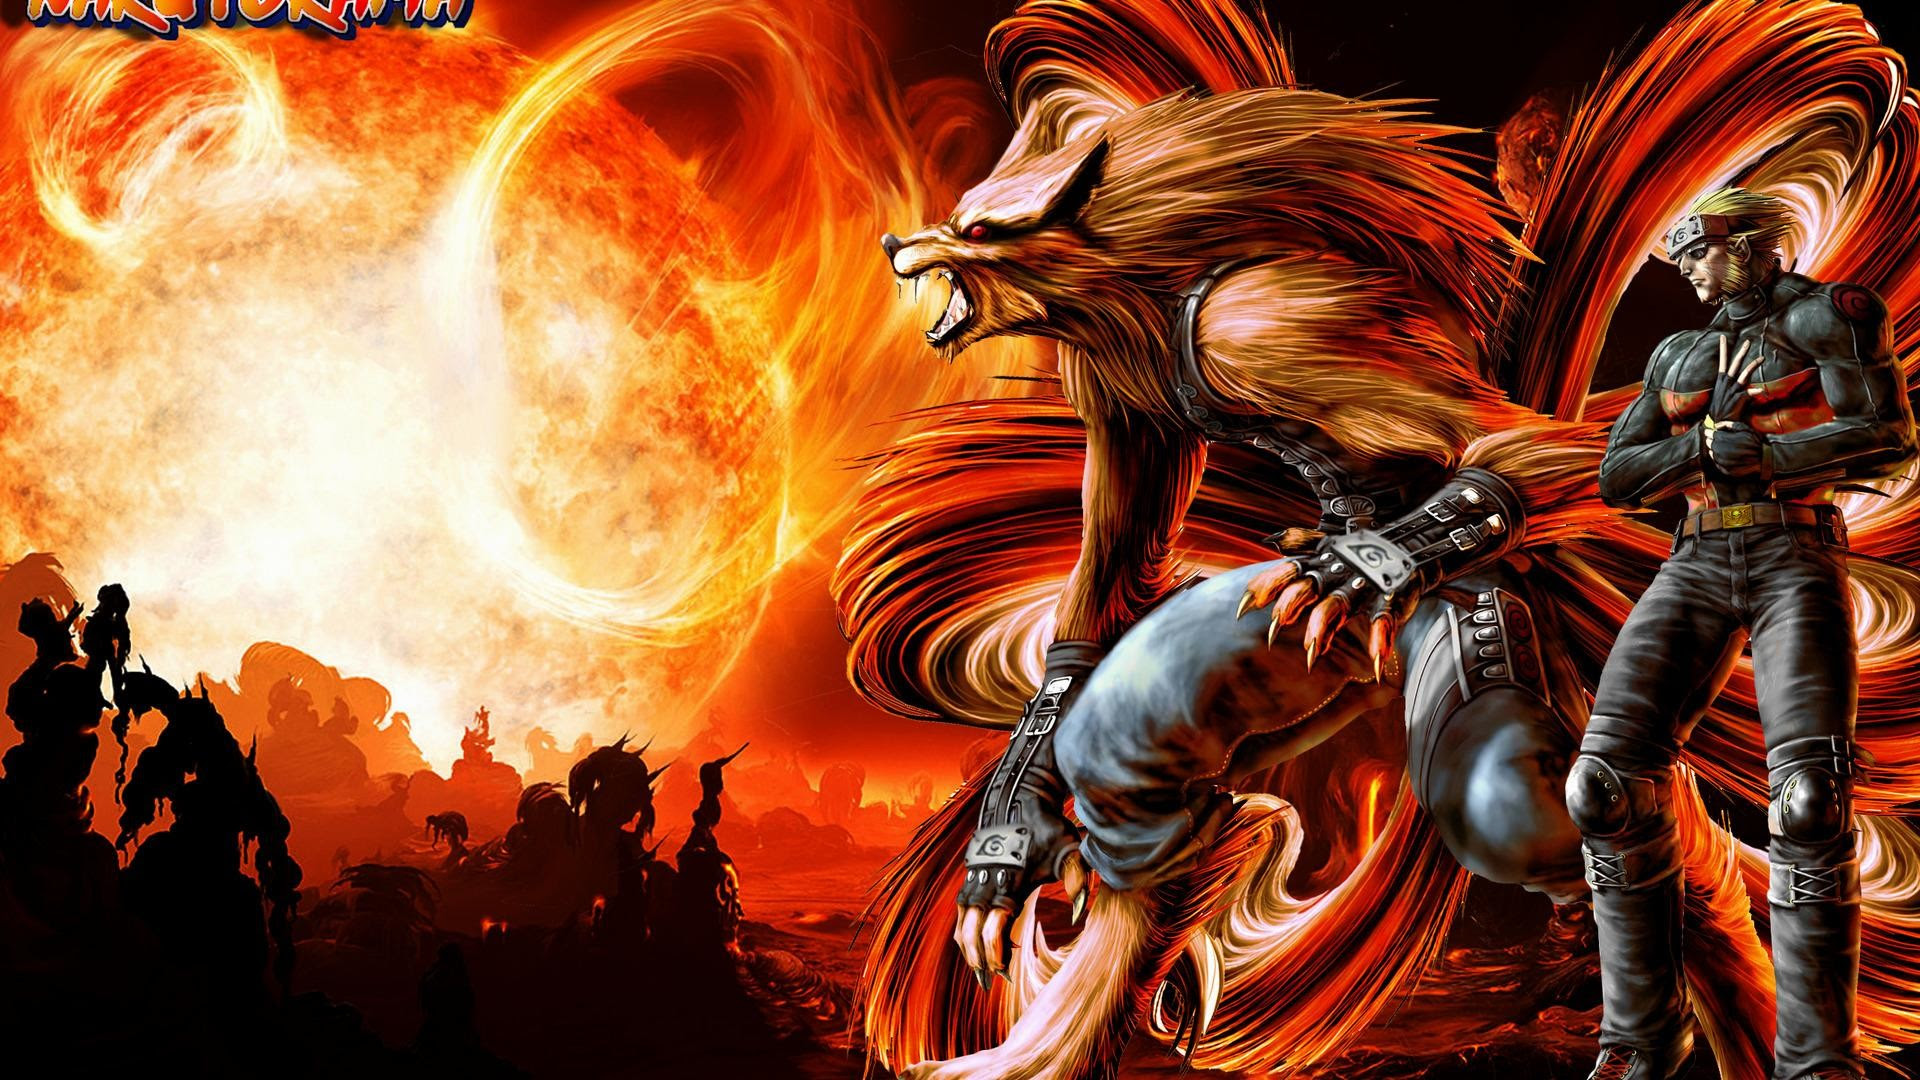 Download 72 Wallpaper 3d Naruto Hd Hd Paling Keren Wallpaper Keren